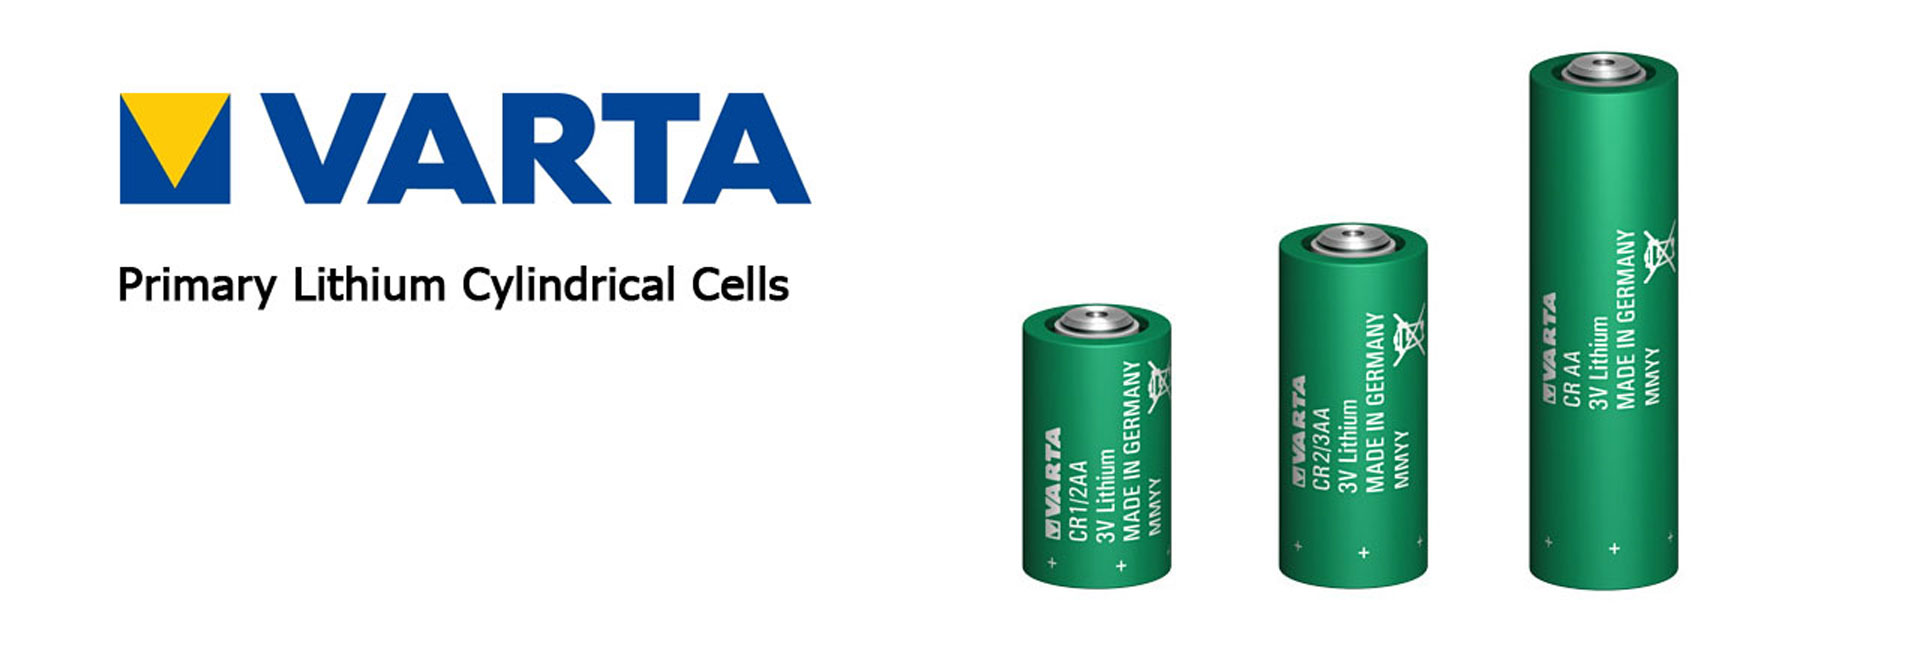 Varta Lithium Battery